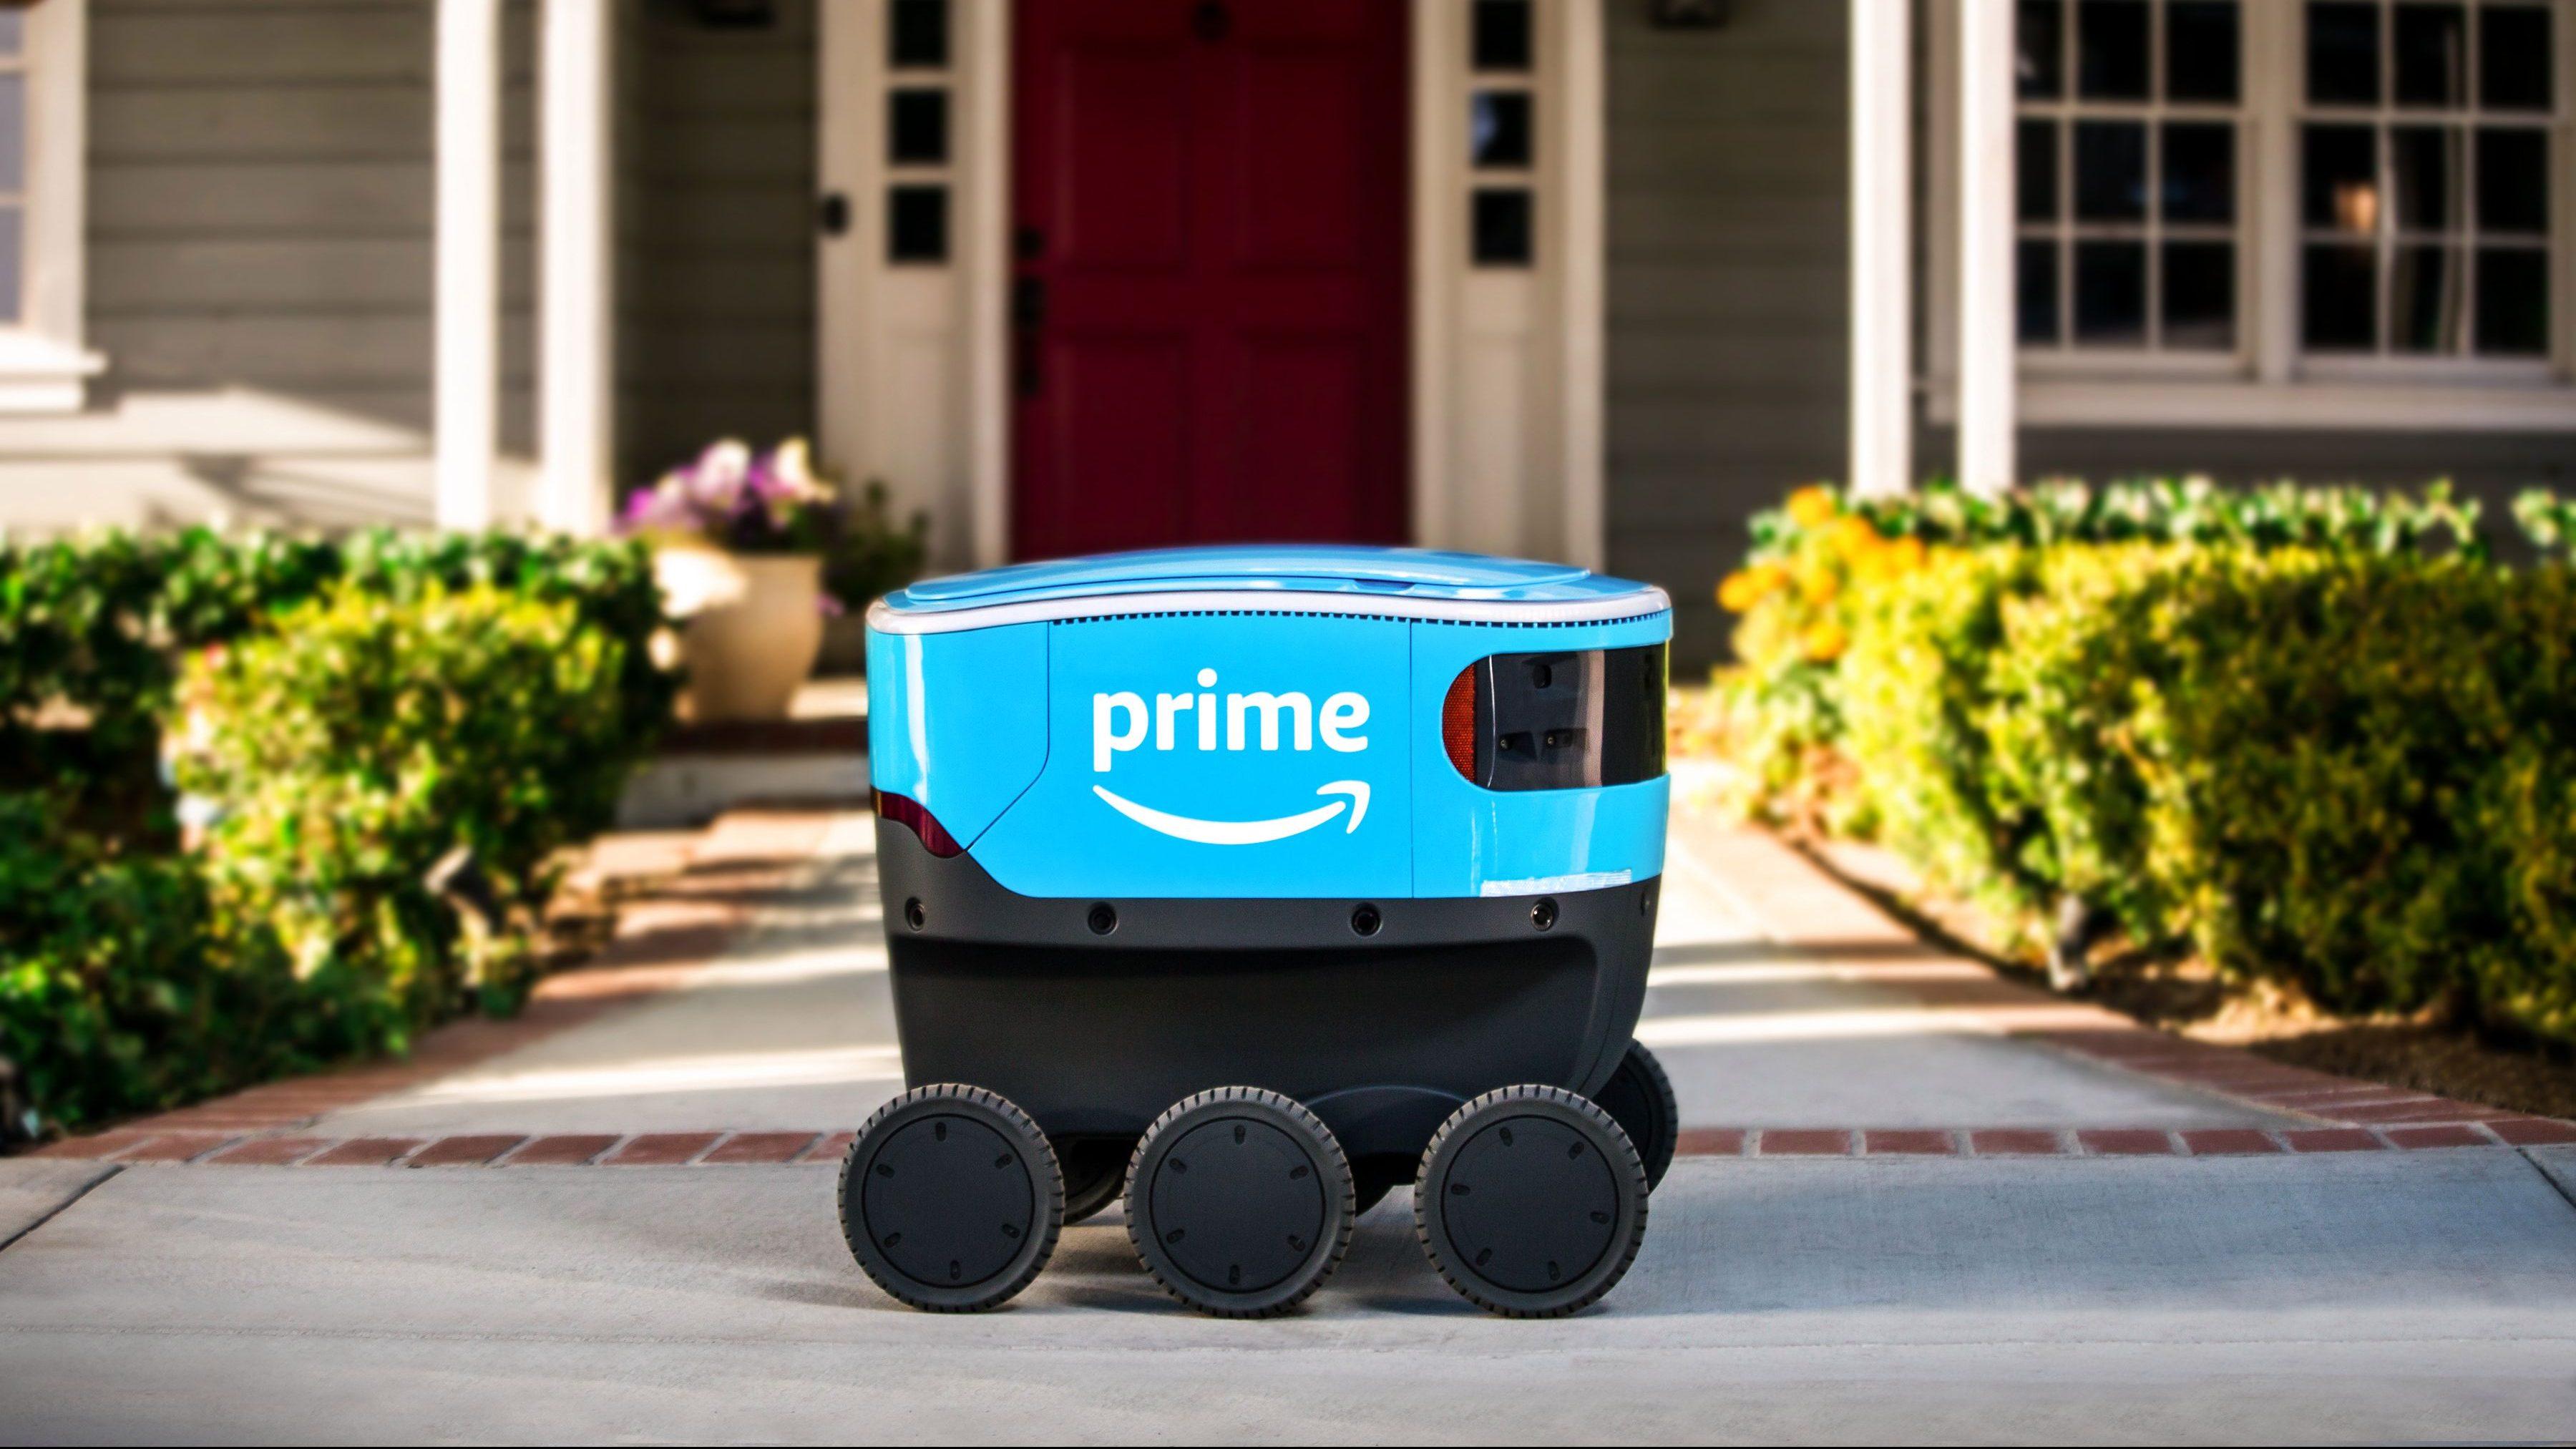 Amazon's new robot Scout delivers packages to rich people — Quartz